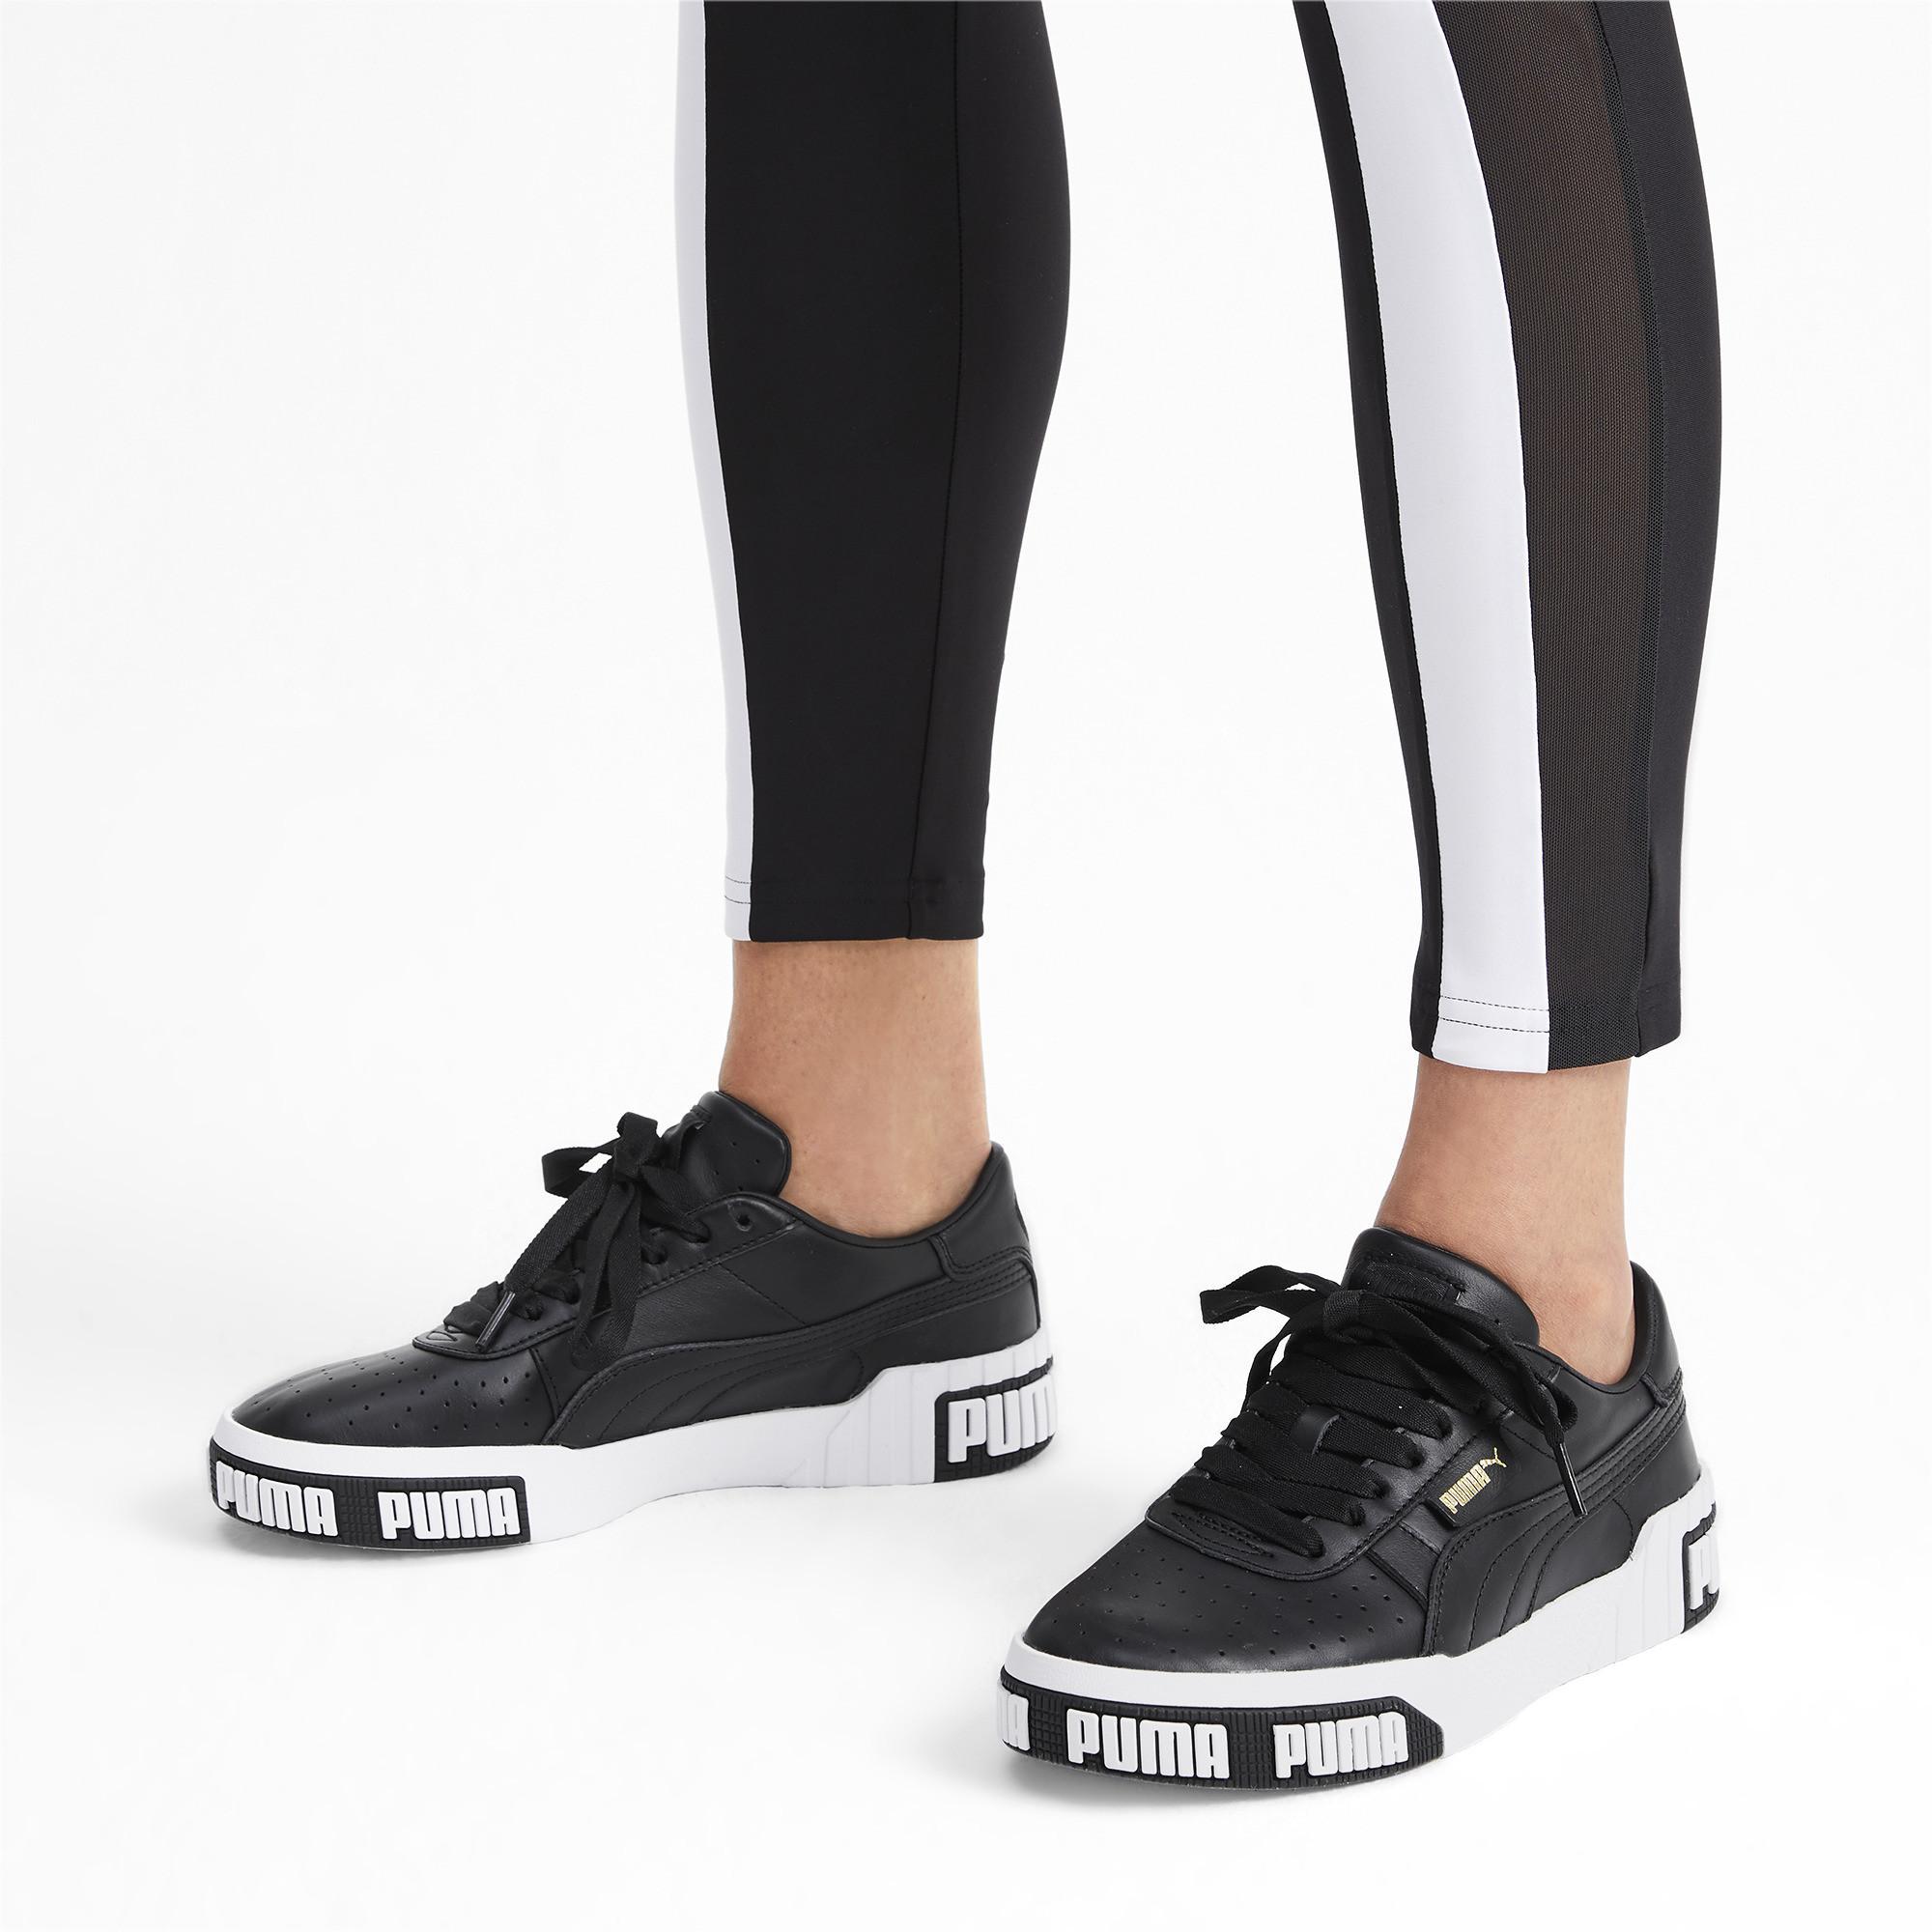 0ba886af53 PUMA - Metallic Cali Bold Women's Sneakers - Lyst. View fullscreen